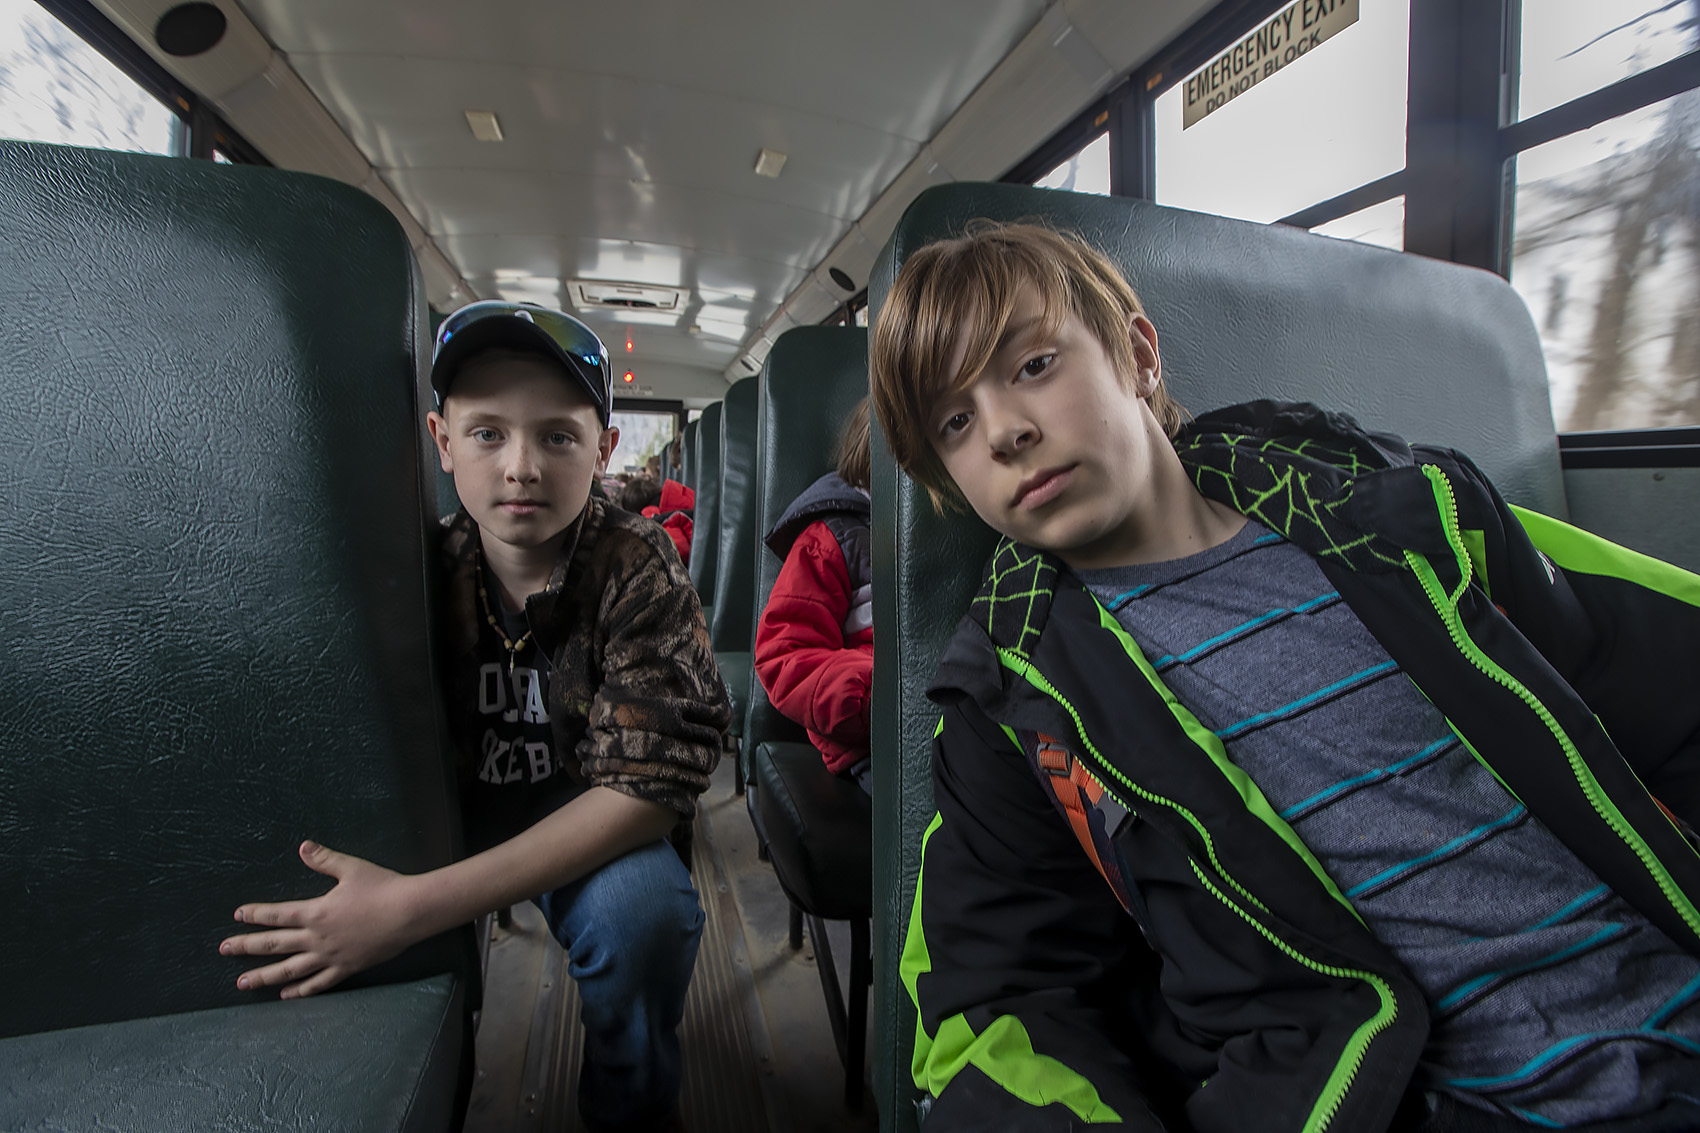 Kaiden Piantanida, left, and Everett Jones on the school bus. (Jesse Costa/WBUR)